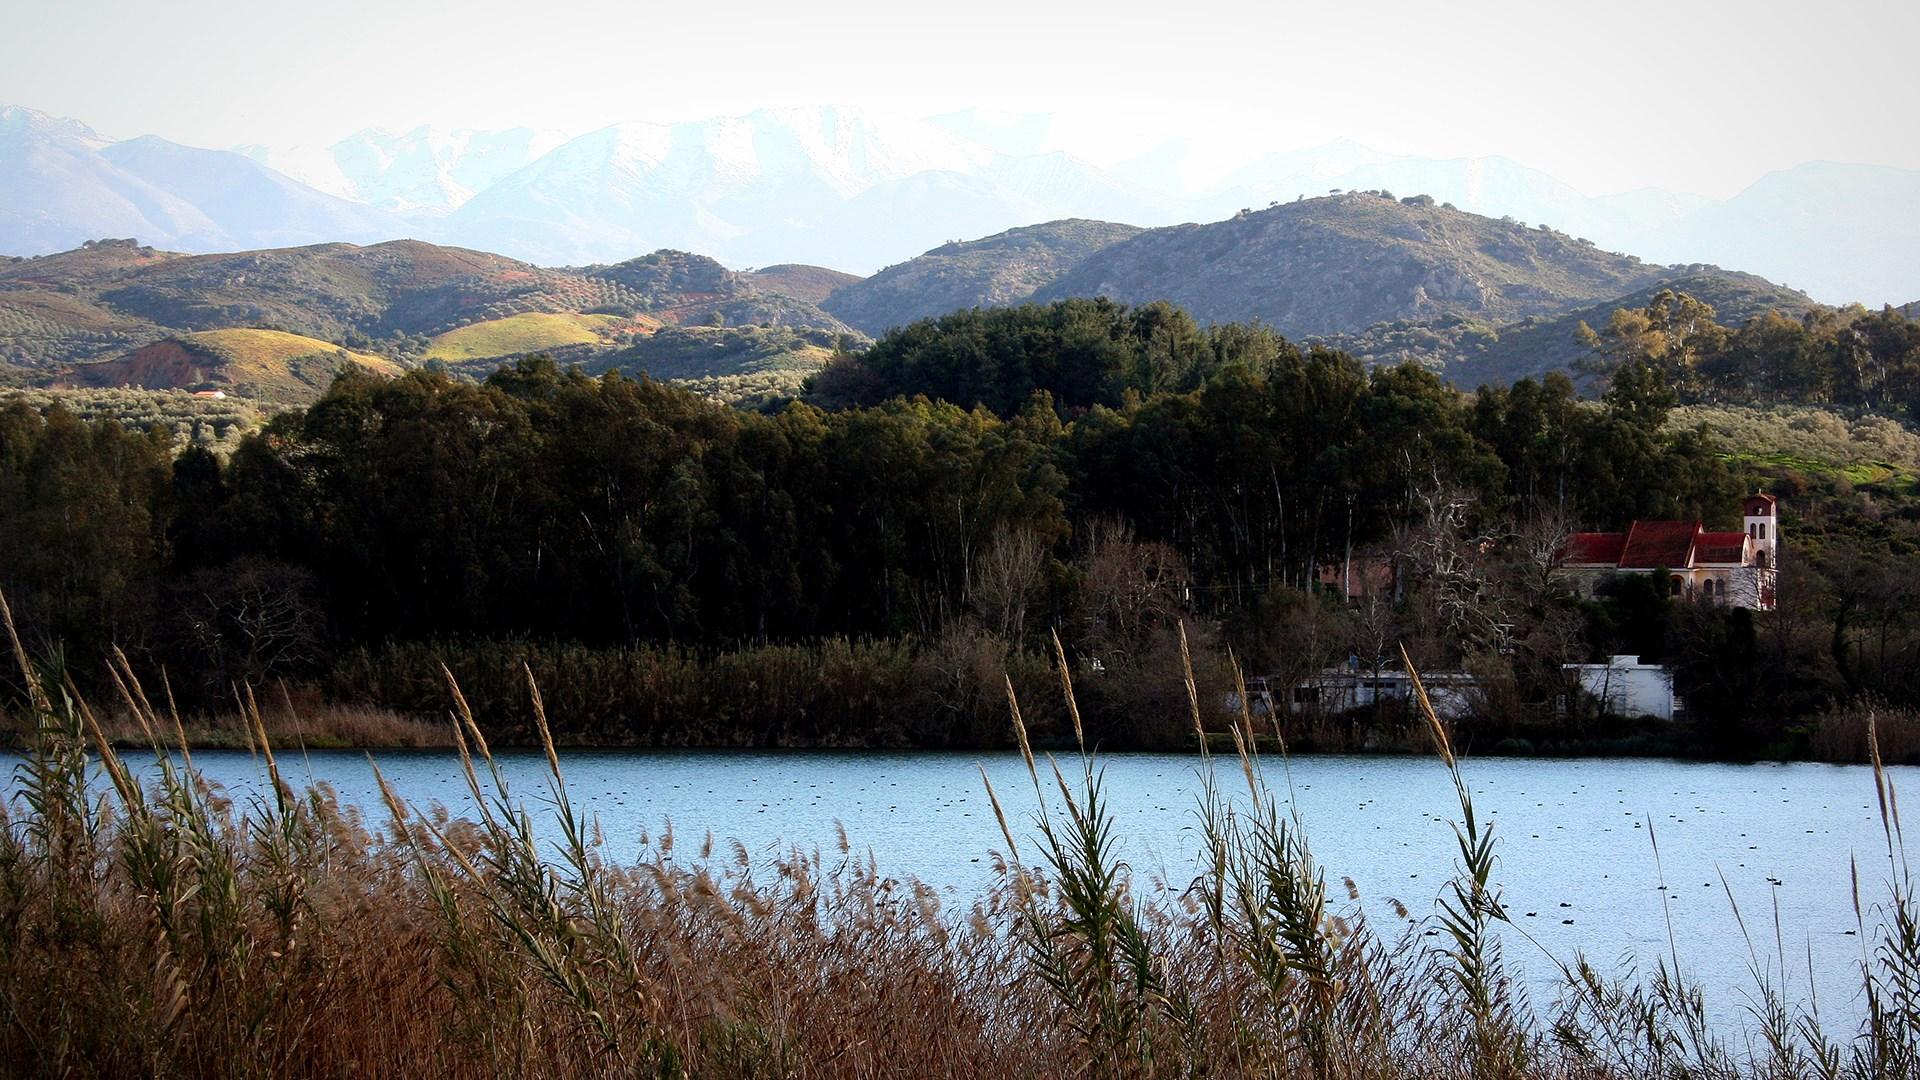 Lake Agias, Chania-Crete | 13 Nov 2016 | Alargo